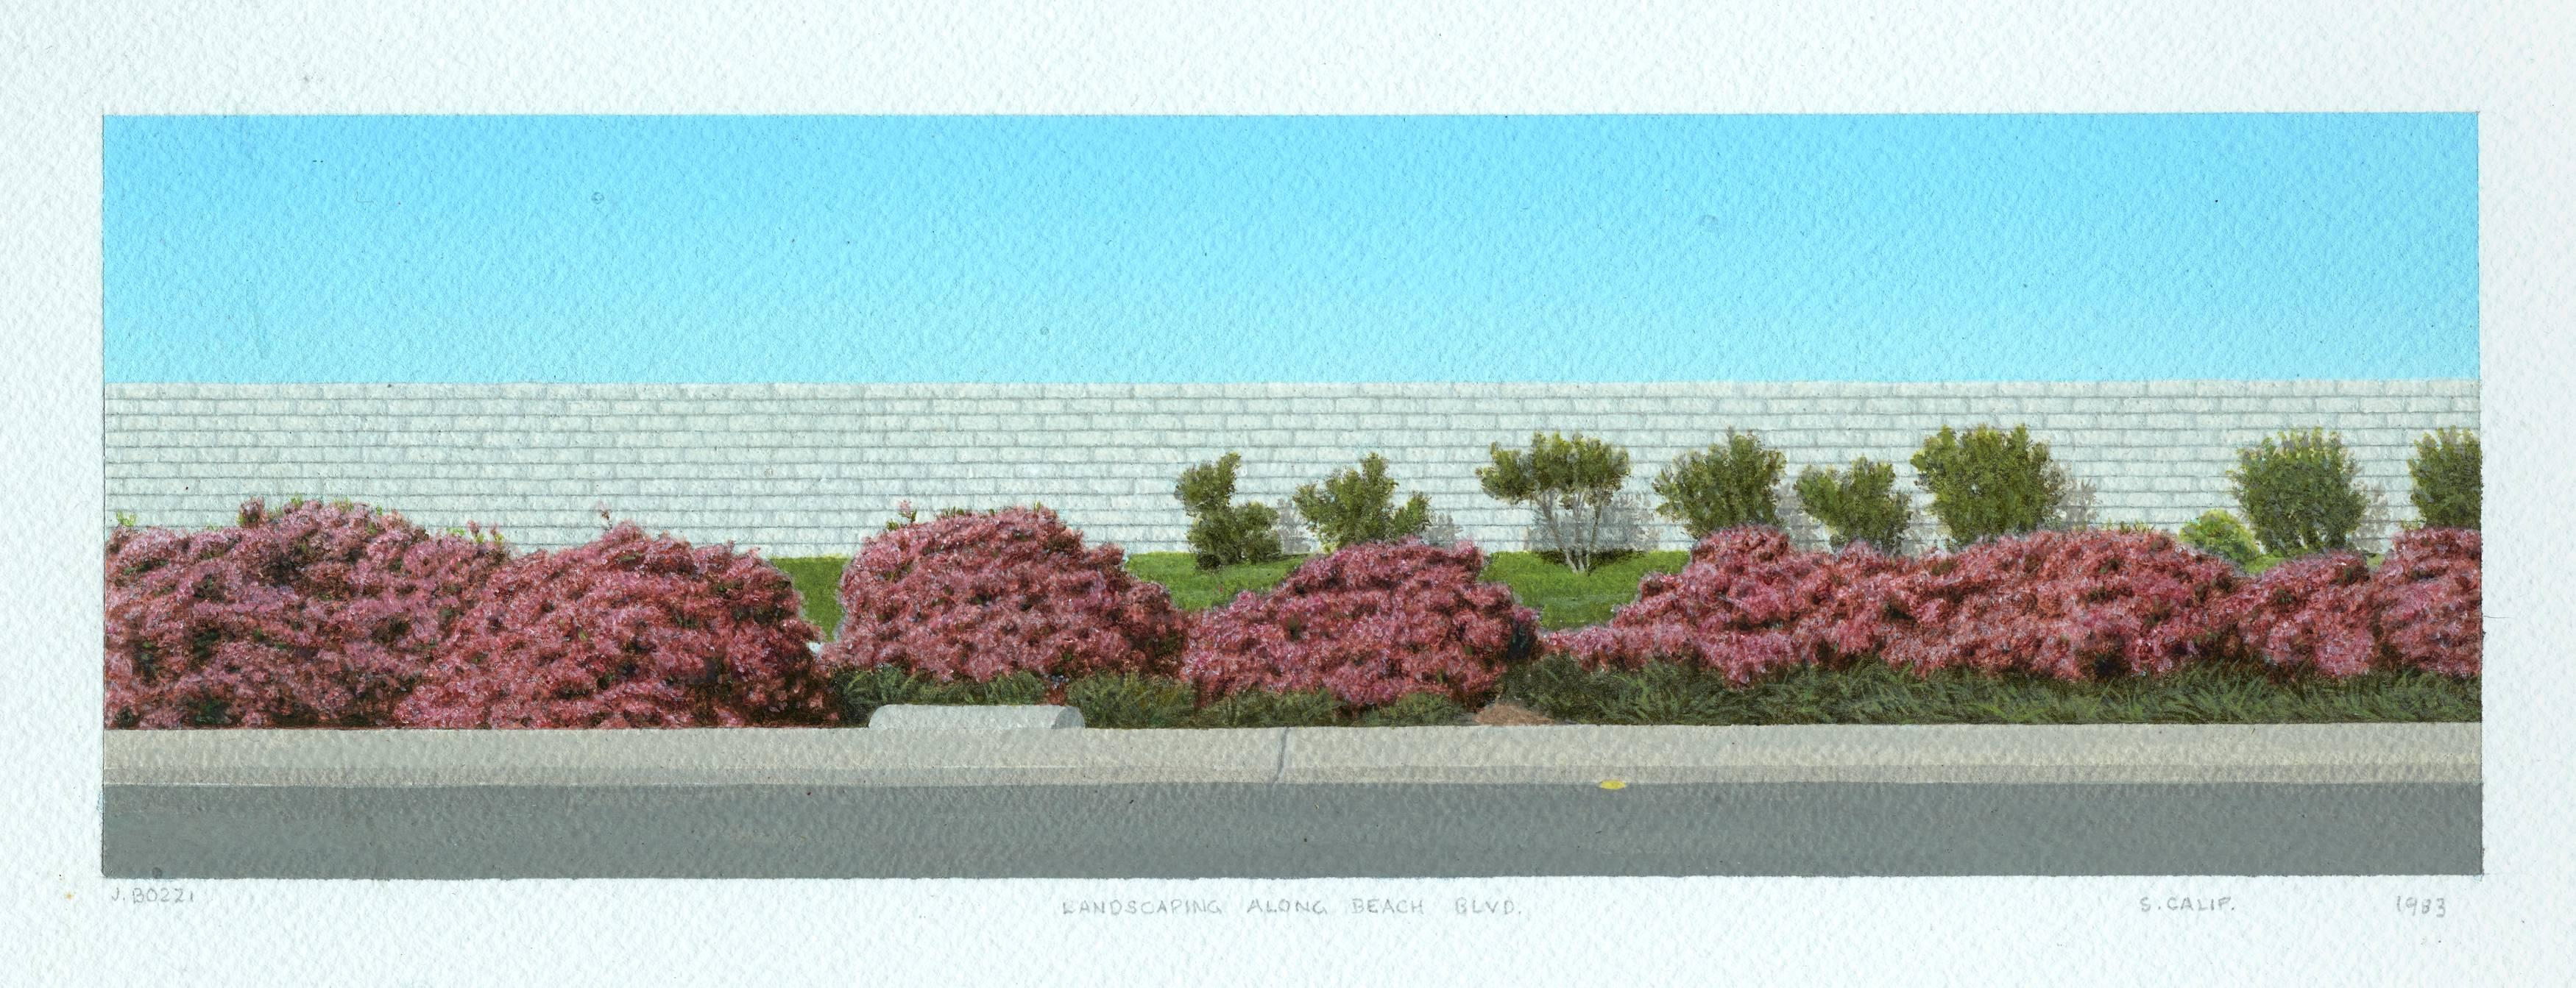 Landscape Along Beach Blvd.